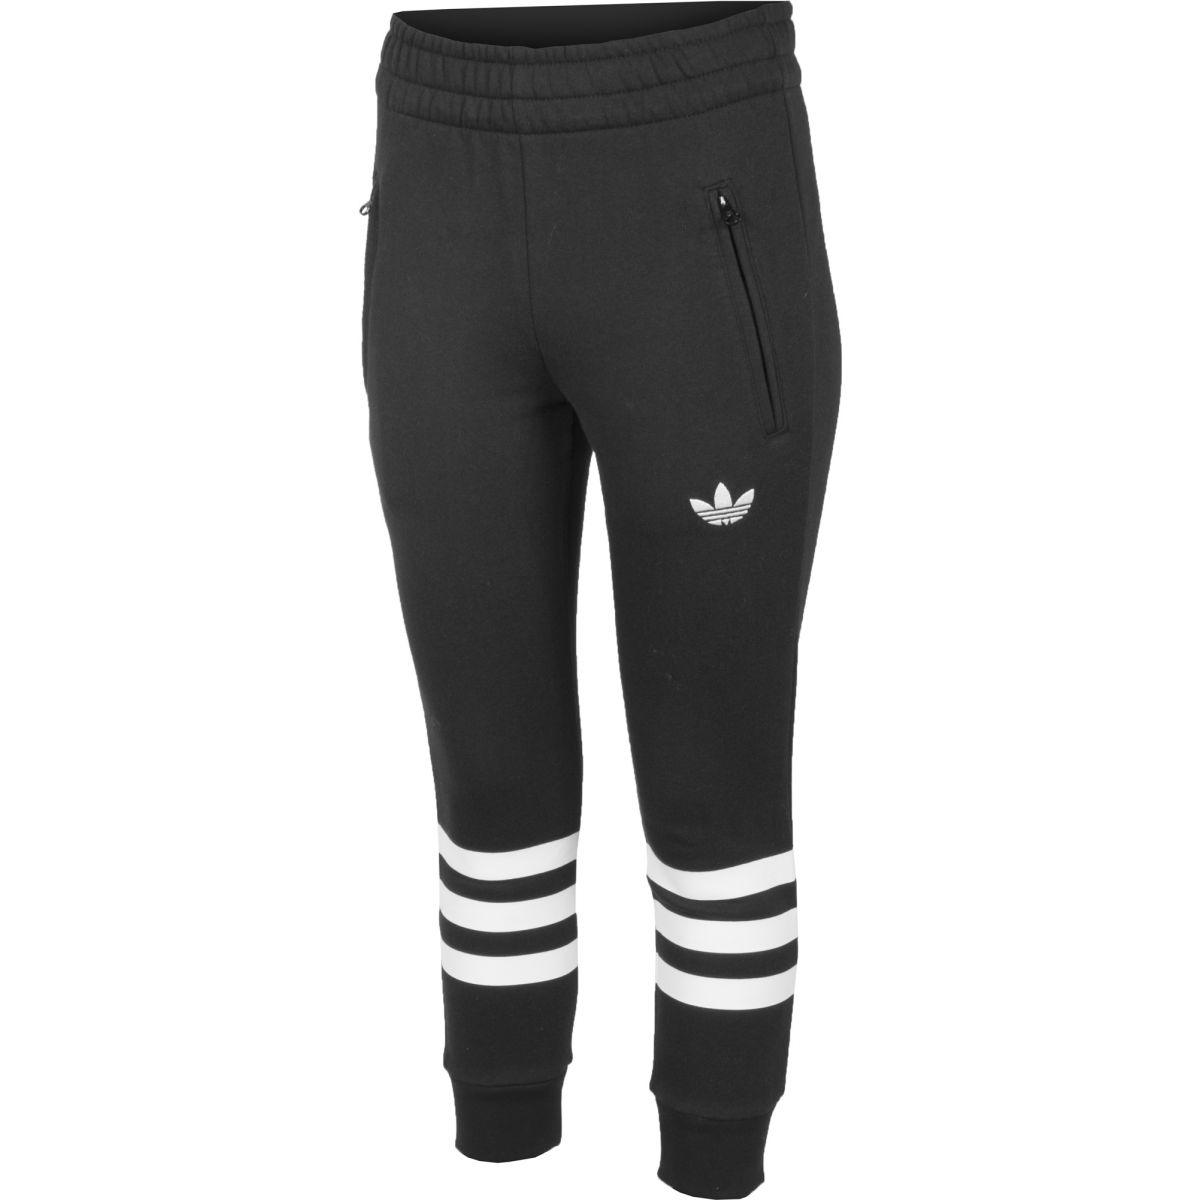 Tepláky Adidas ORIGINALS J Fleece Pants Junior - S96068  94ce7afb1a7